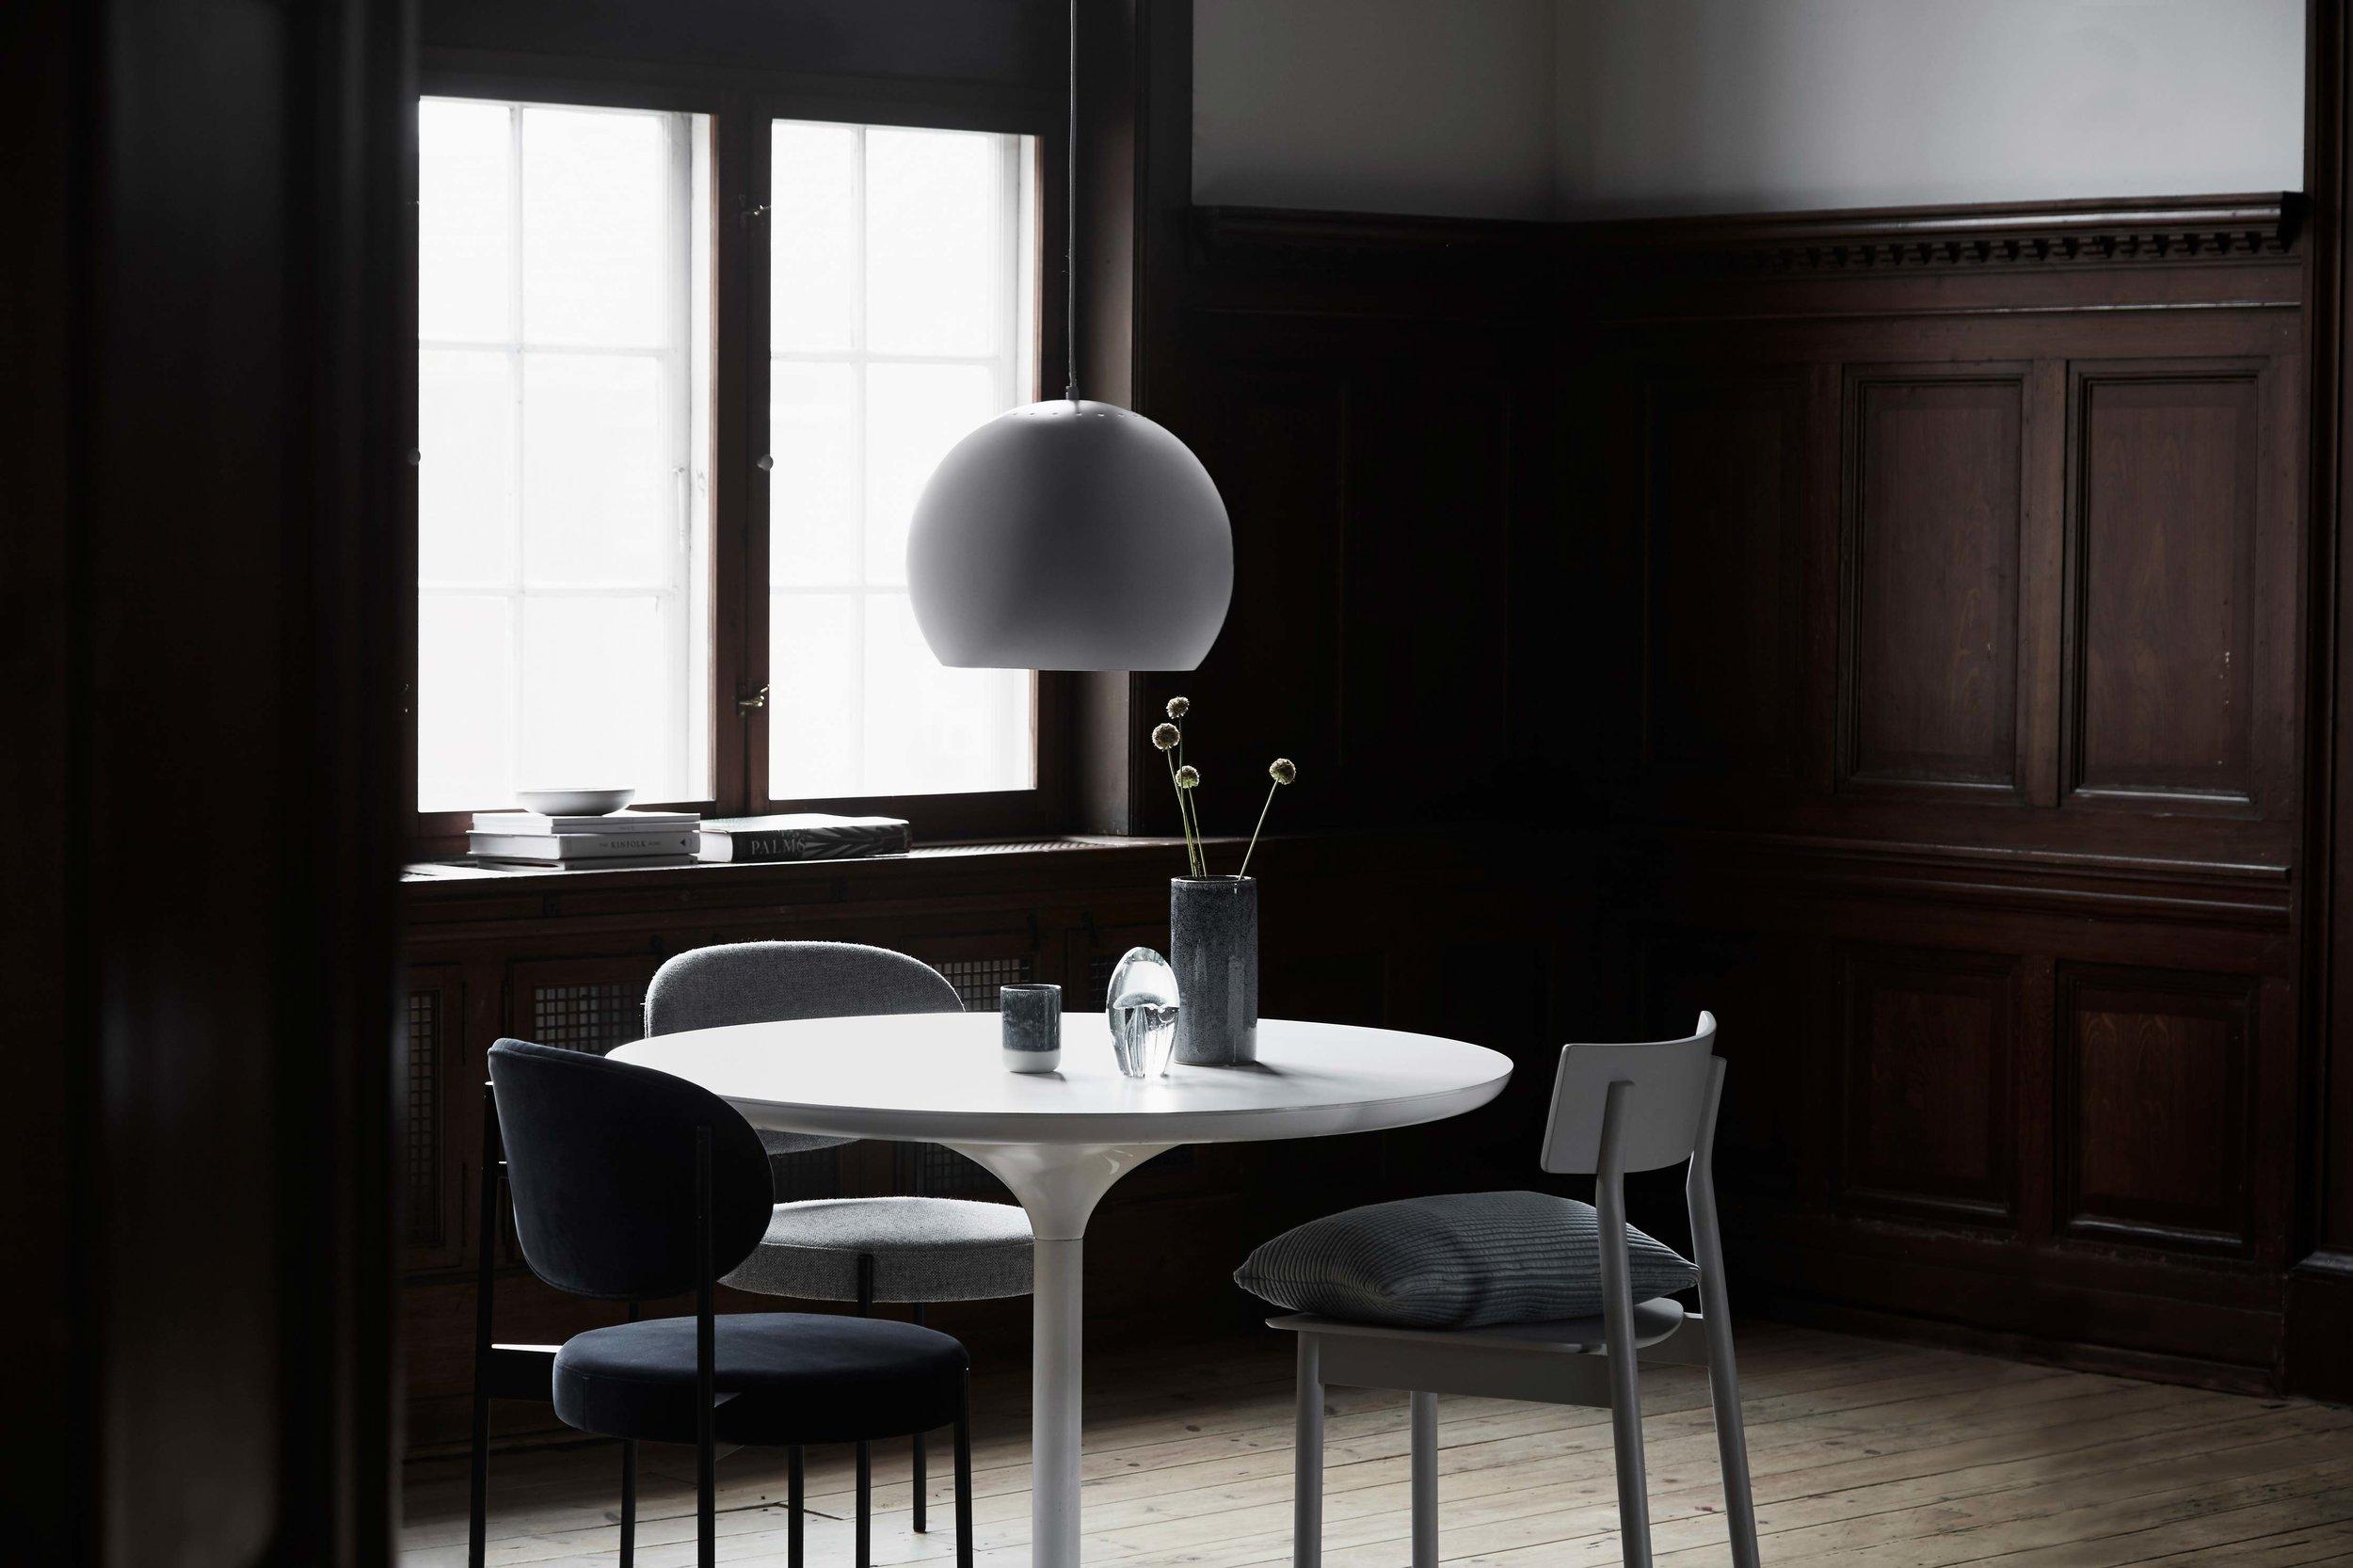 Ball-pendant-40-cm-aluminium-grey-matt---lifestyle-raadhusgade-1530.jpg